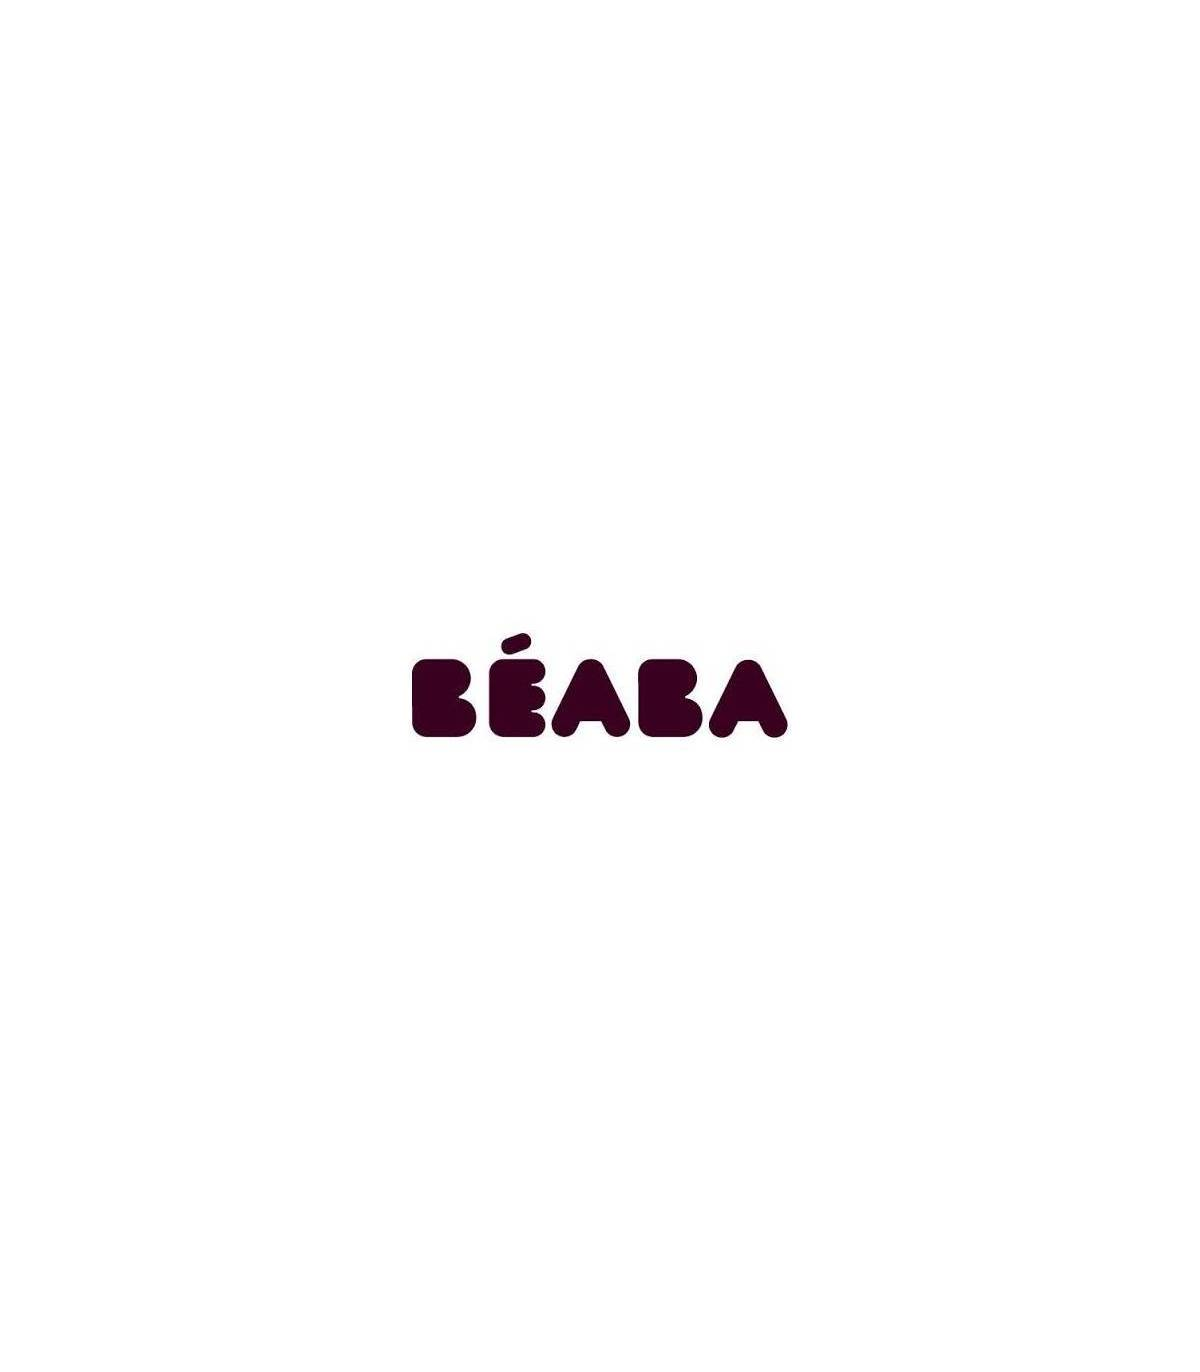 Beaba Baby-Löffel - Blau